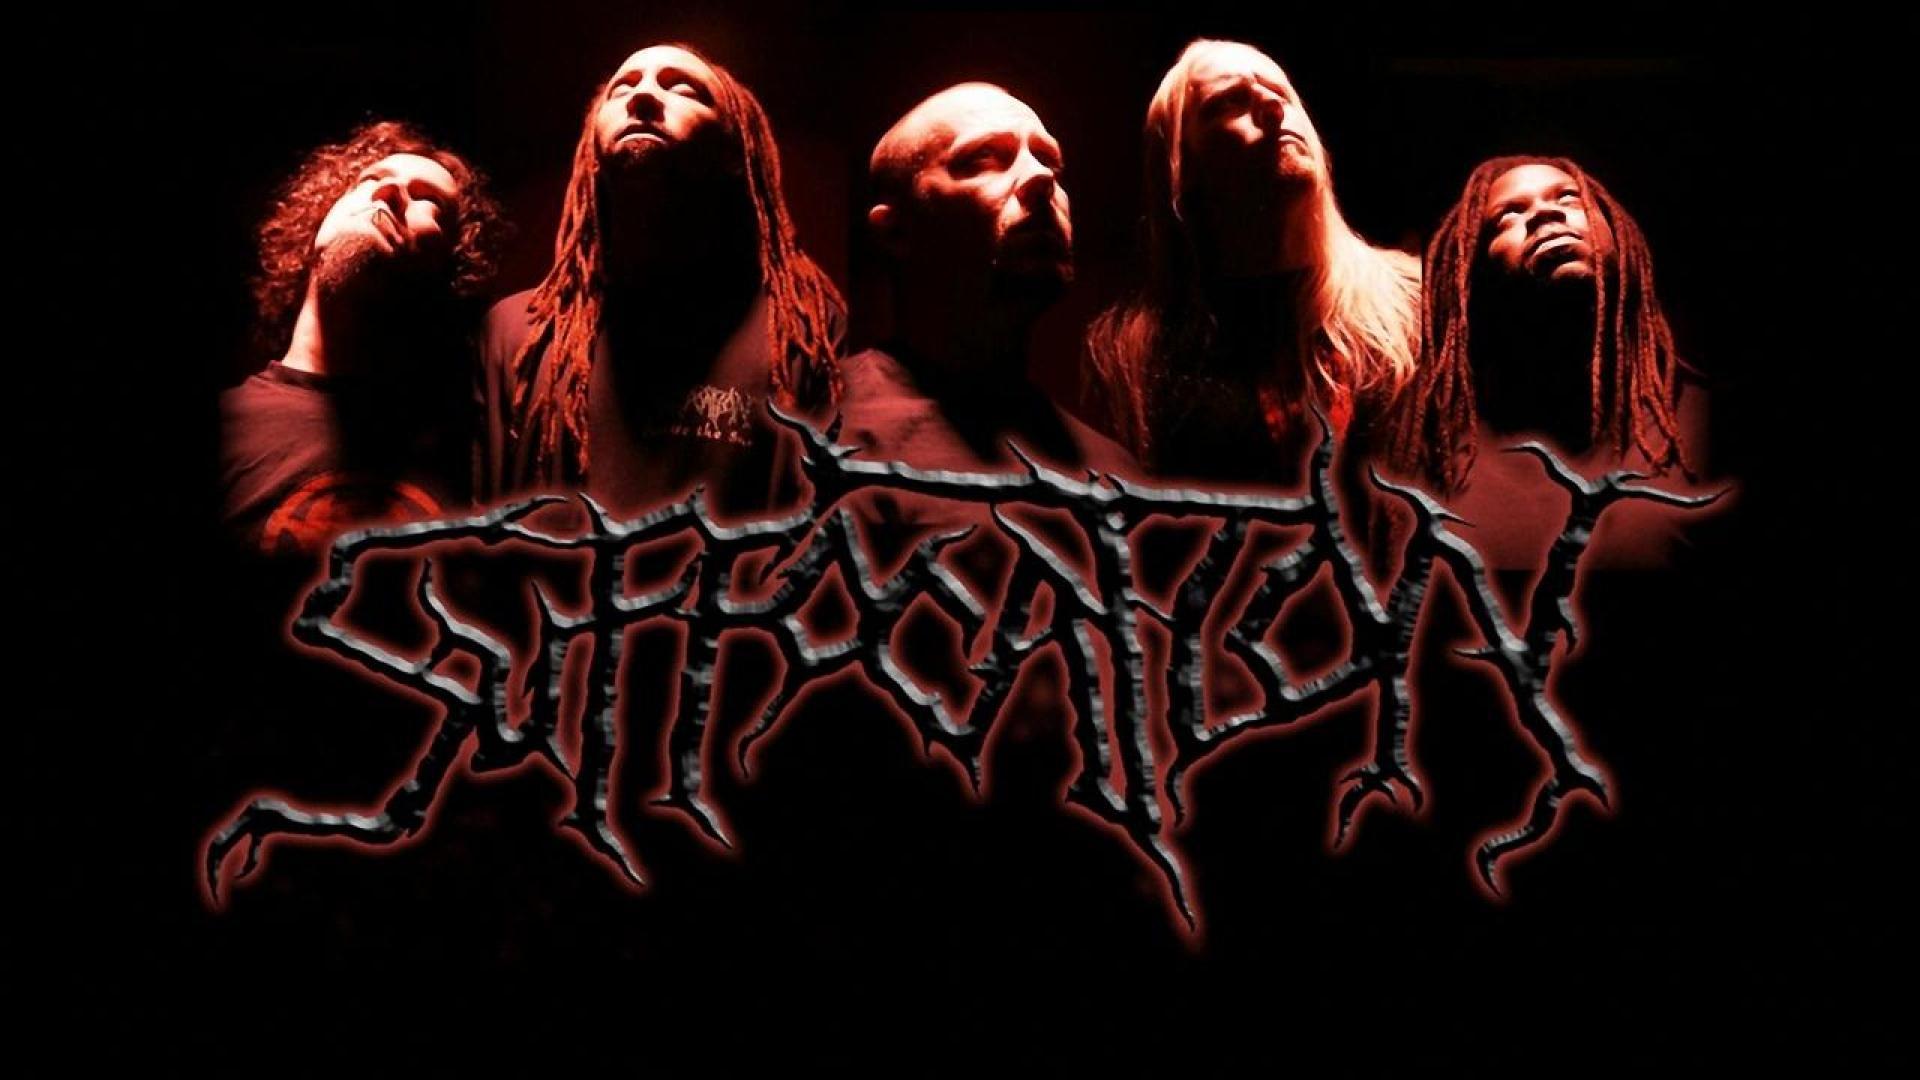 Death metal wallpapers wallpapersafari - Death metal wallpaper hd ...